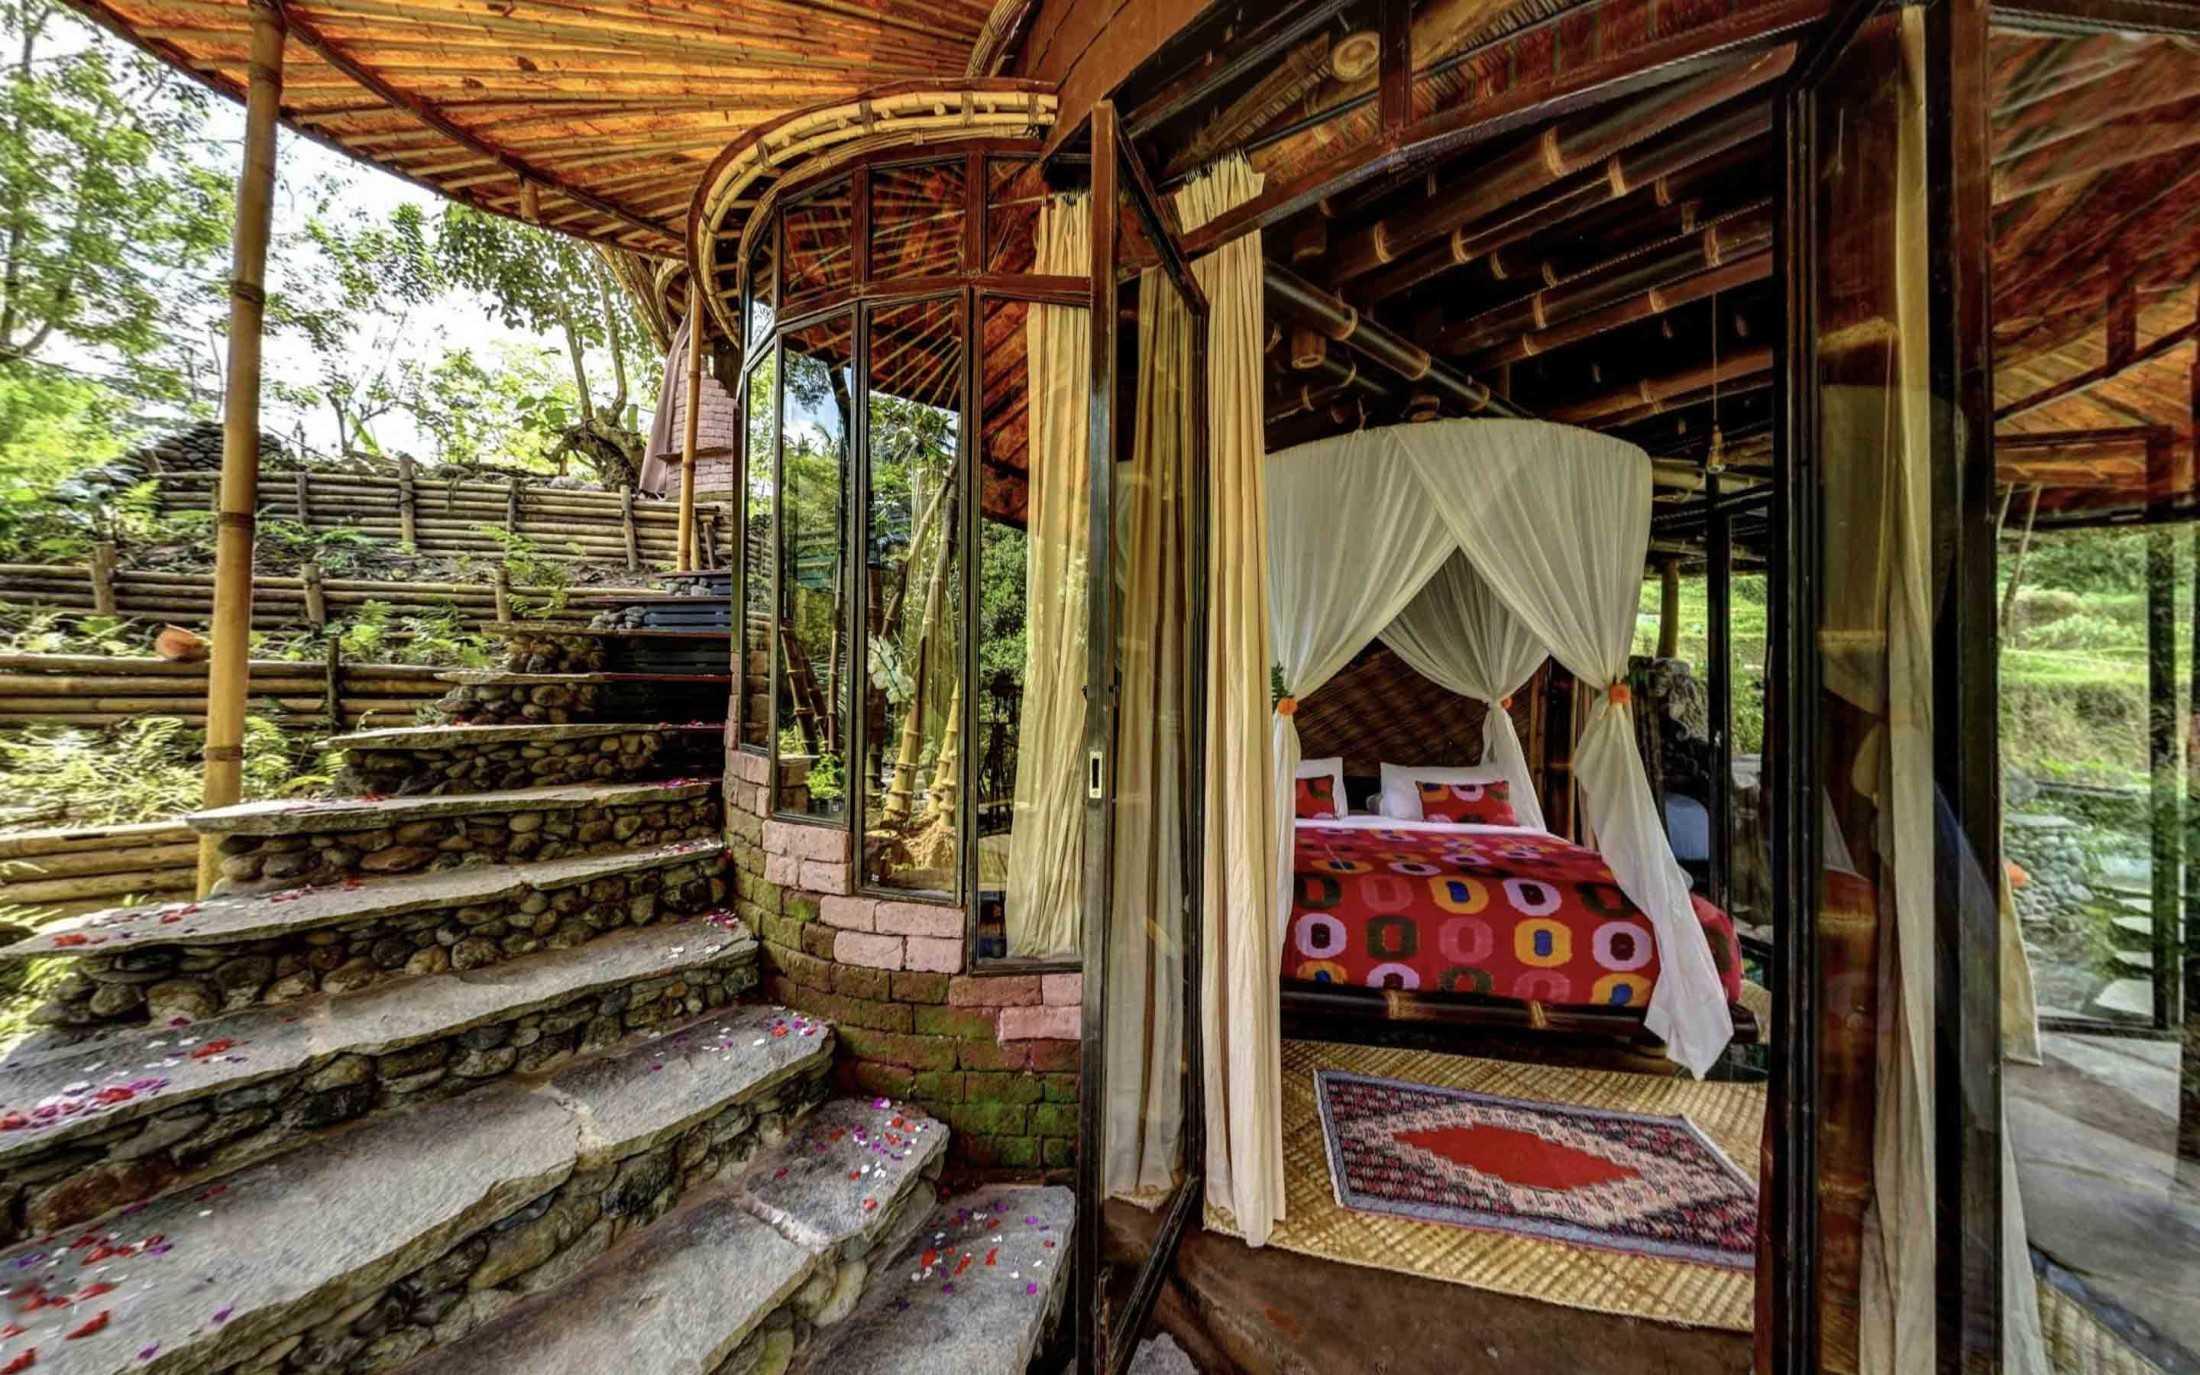 Agung Budi Raharsa | Architecture & Engineering Riverbend Bamboo House - Bali Bali, Indonesia Bali, Indonesia Courtyard Tropical 88705